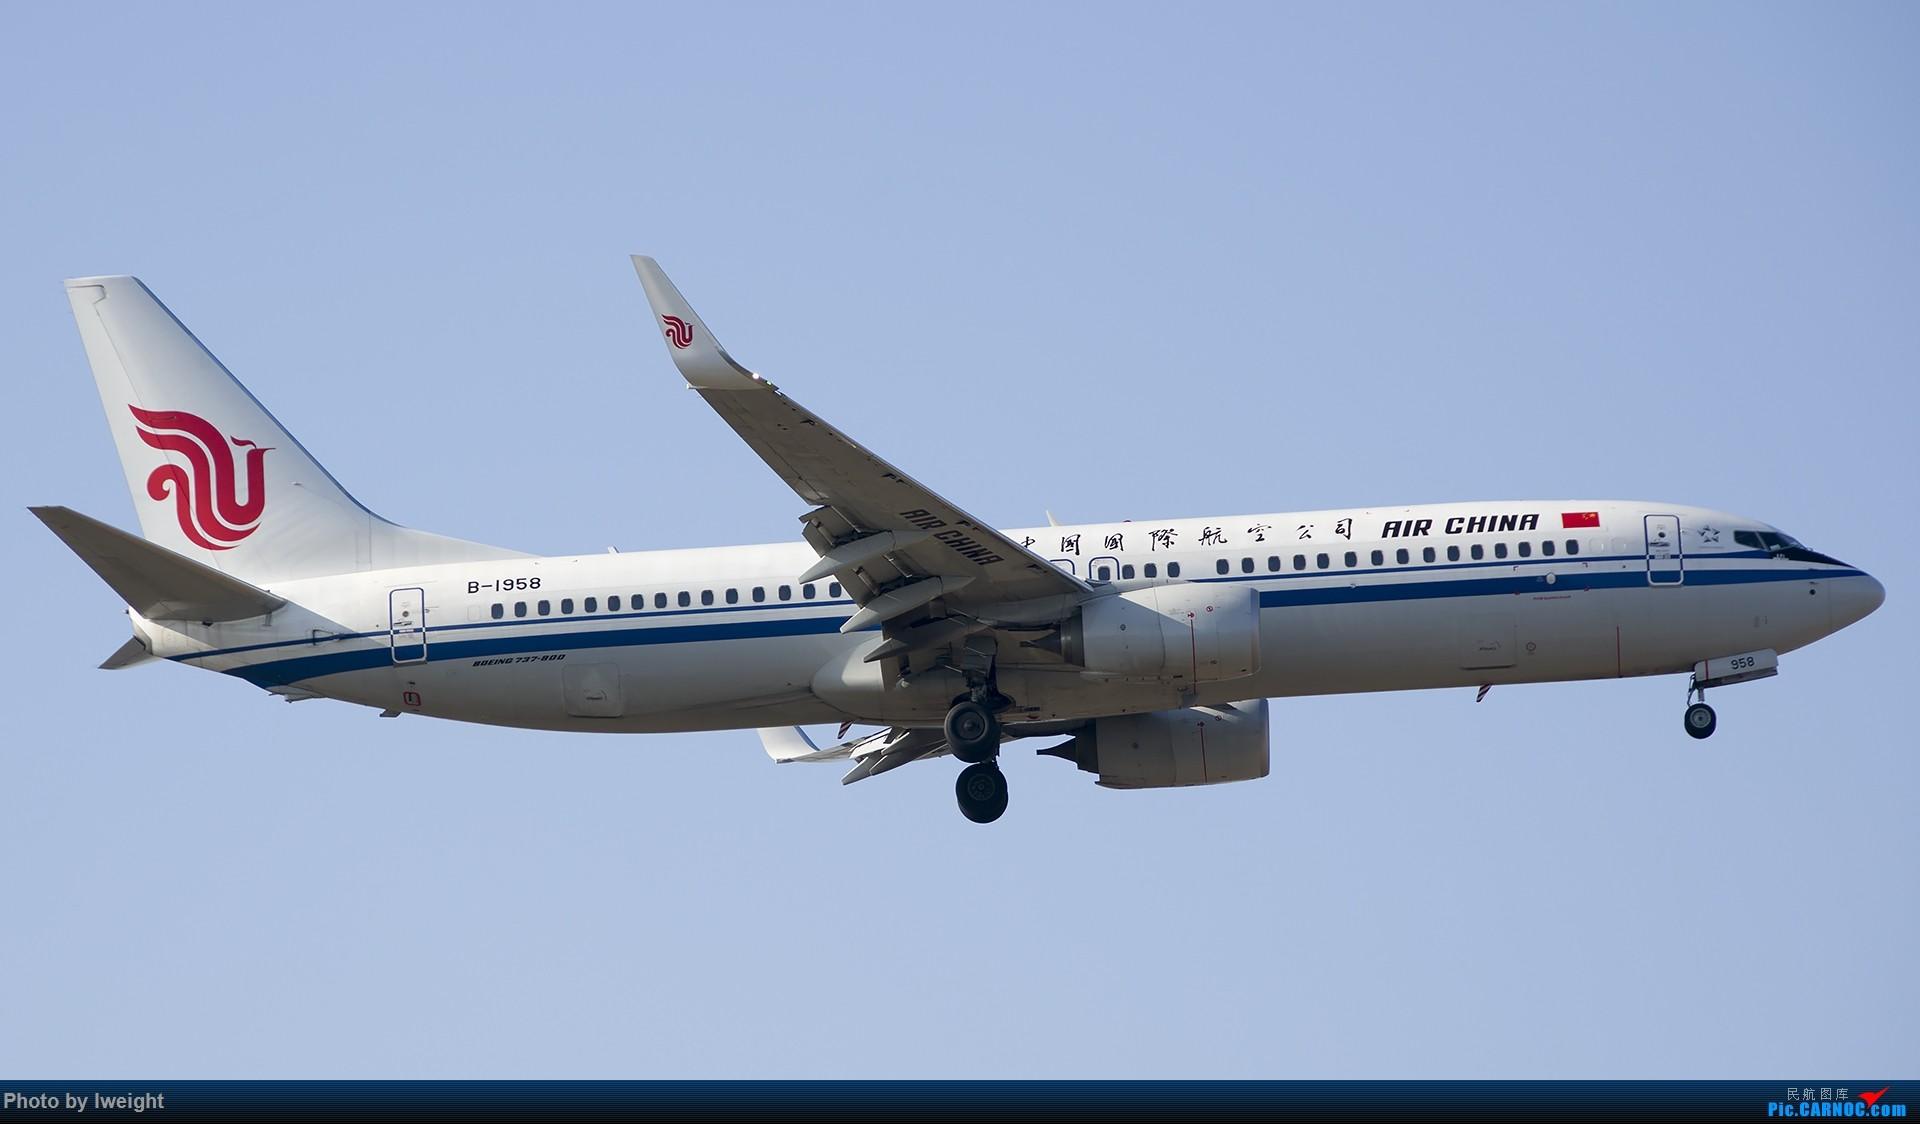 Re:[原创]庆祝升级777,发上今天在首都机场拍的所有飞机【2014-12-14】 BOEING 737-800 B-1958 中国北京首都国际机场